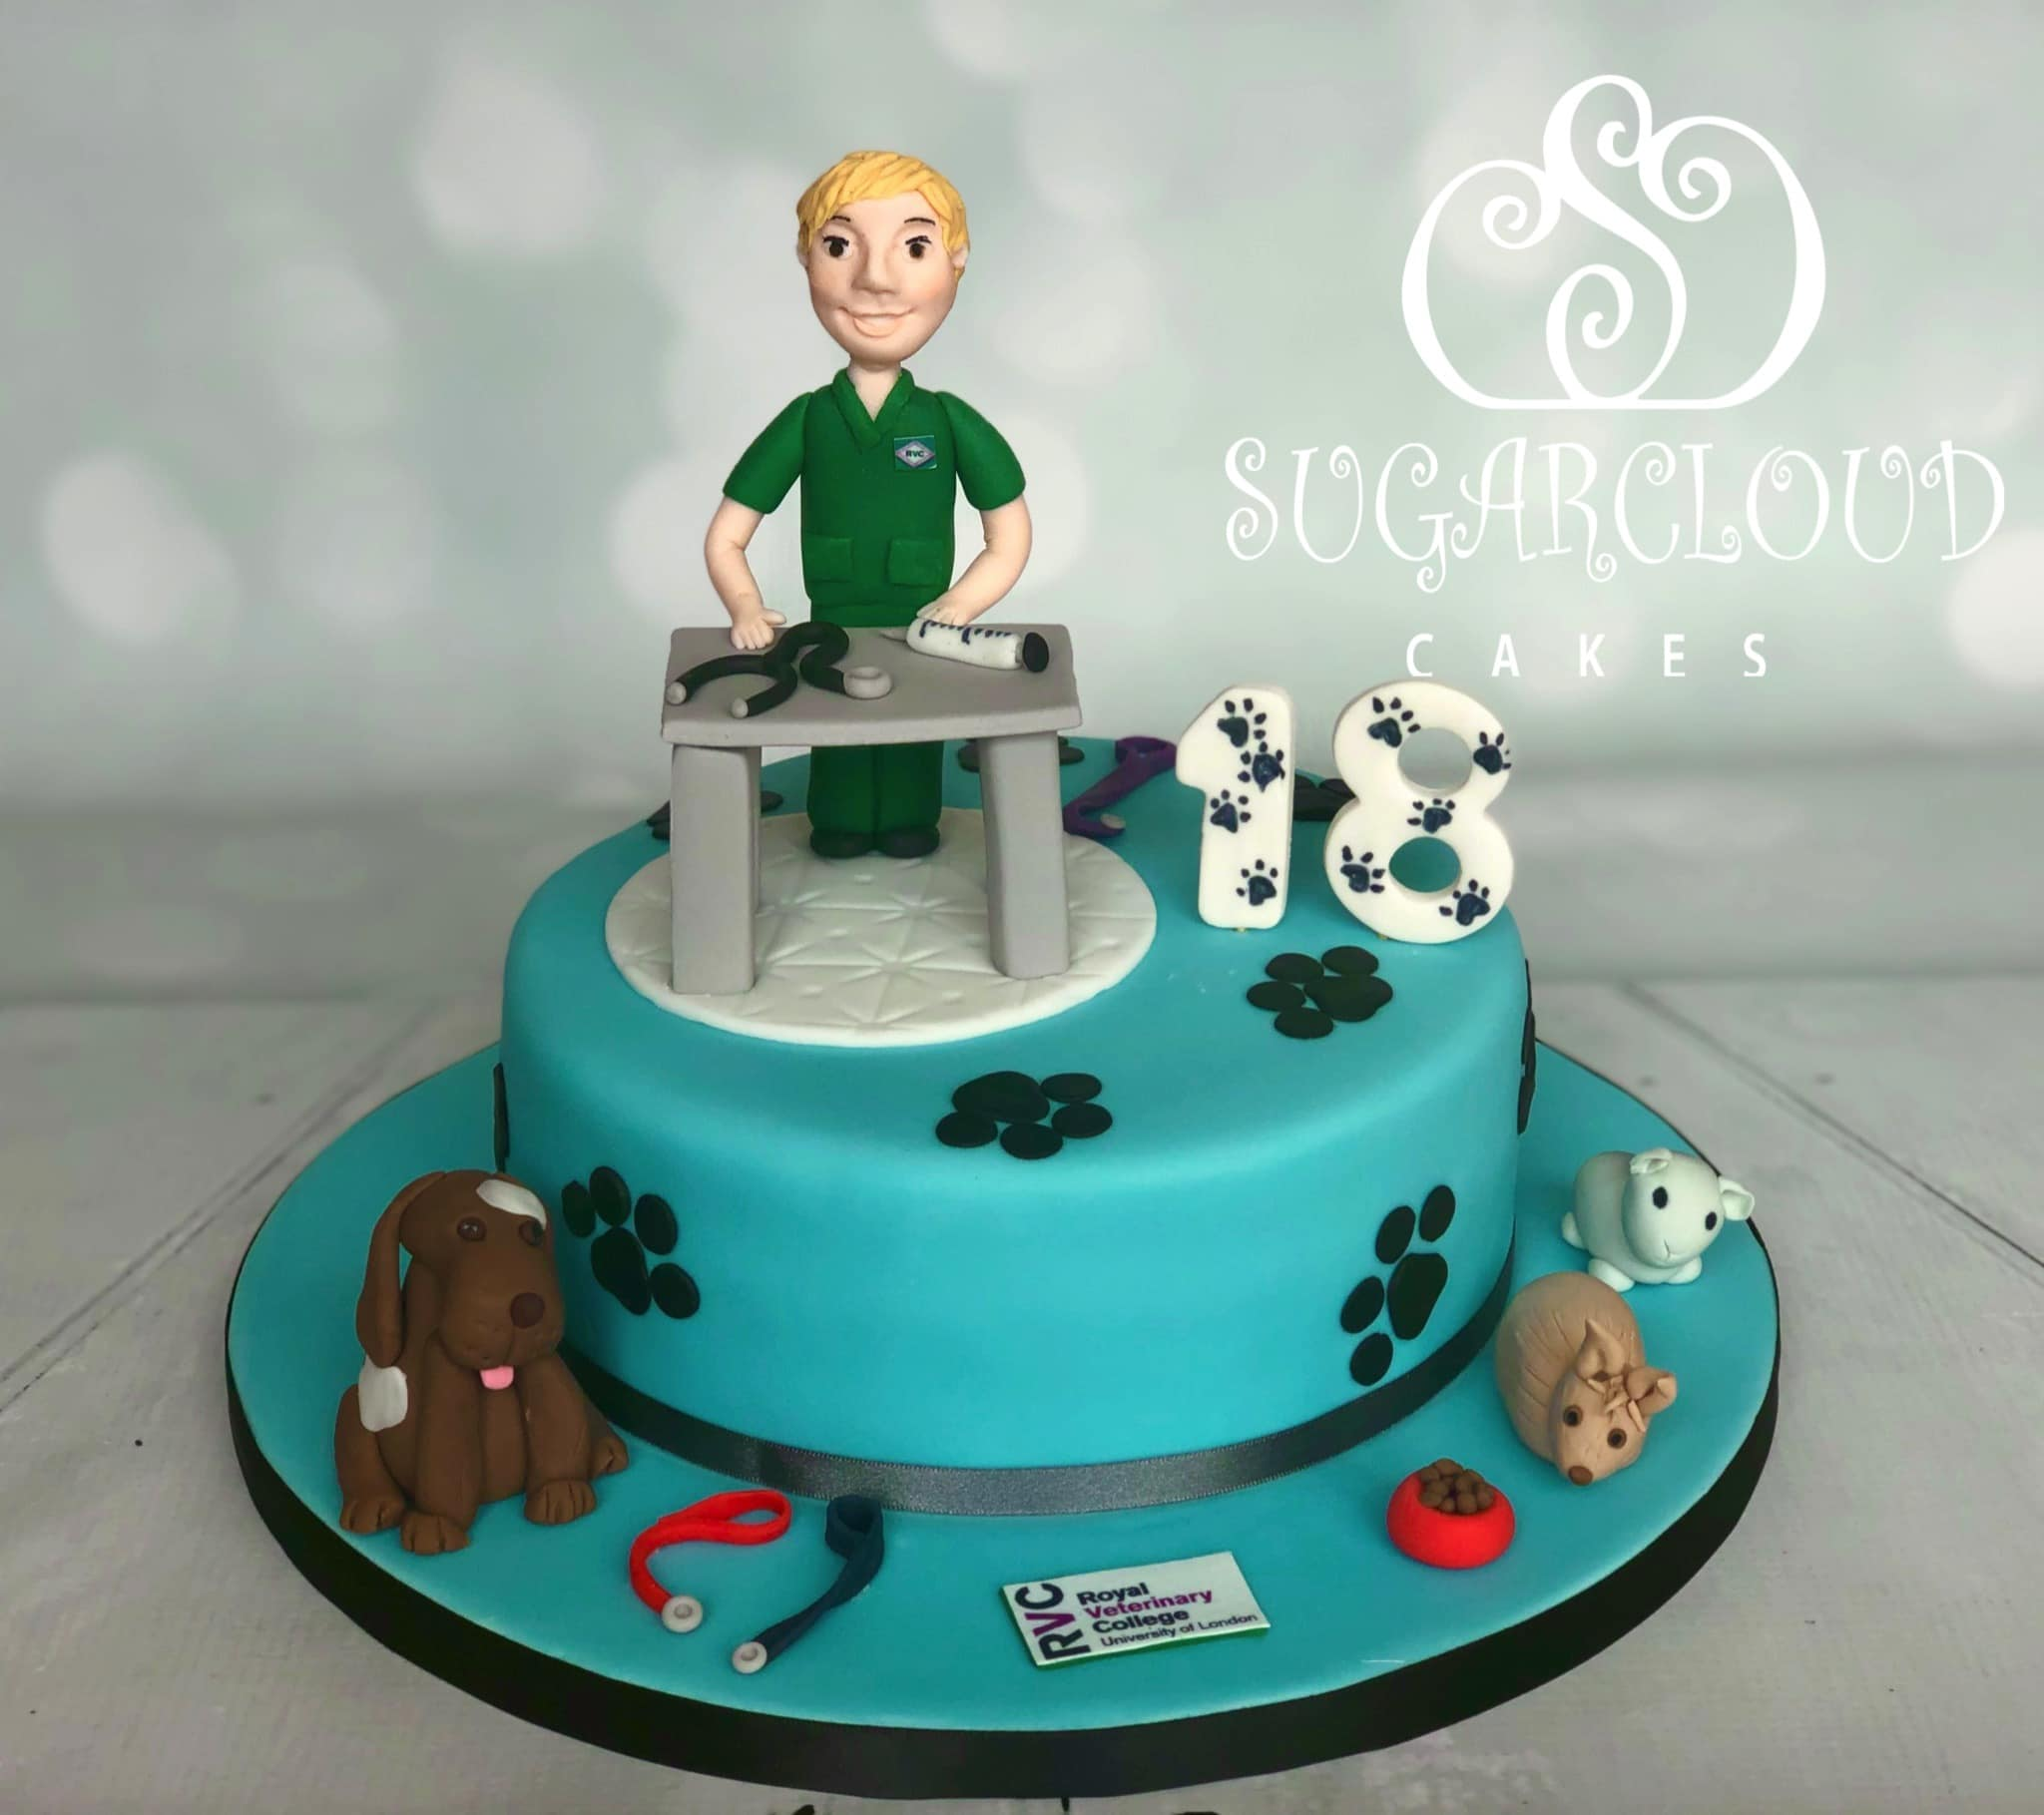 Jack's Vet and Animal Themed 18th Birthday Cake, Nantwich